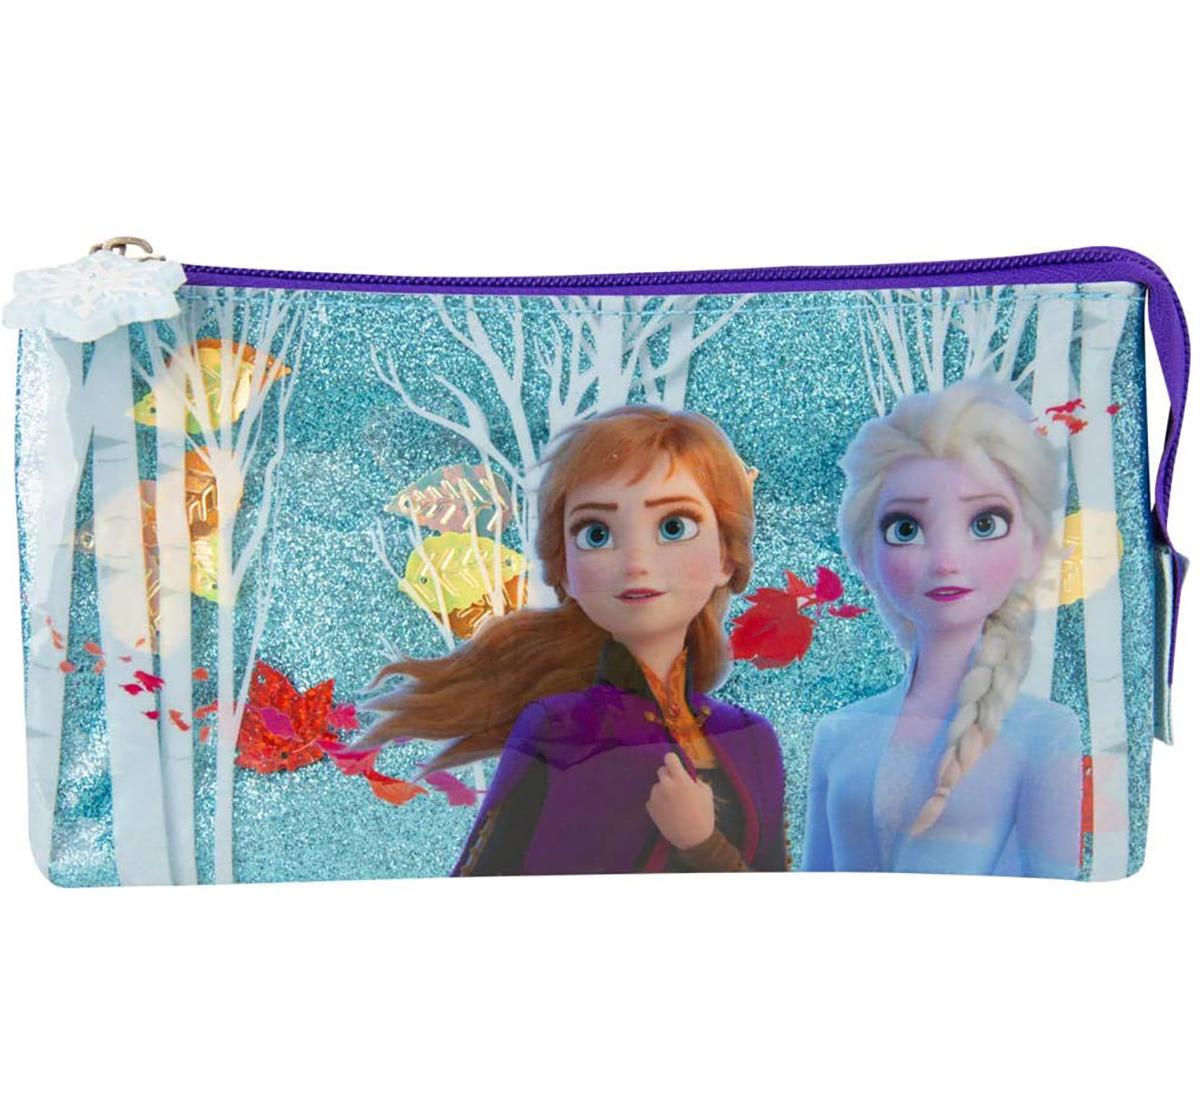 Disney | Disney Frozen2 Confetti Pencil Case With Pom Pom Bags for Girls age 3Y+